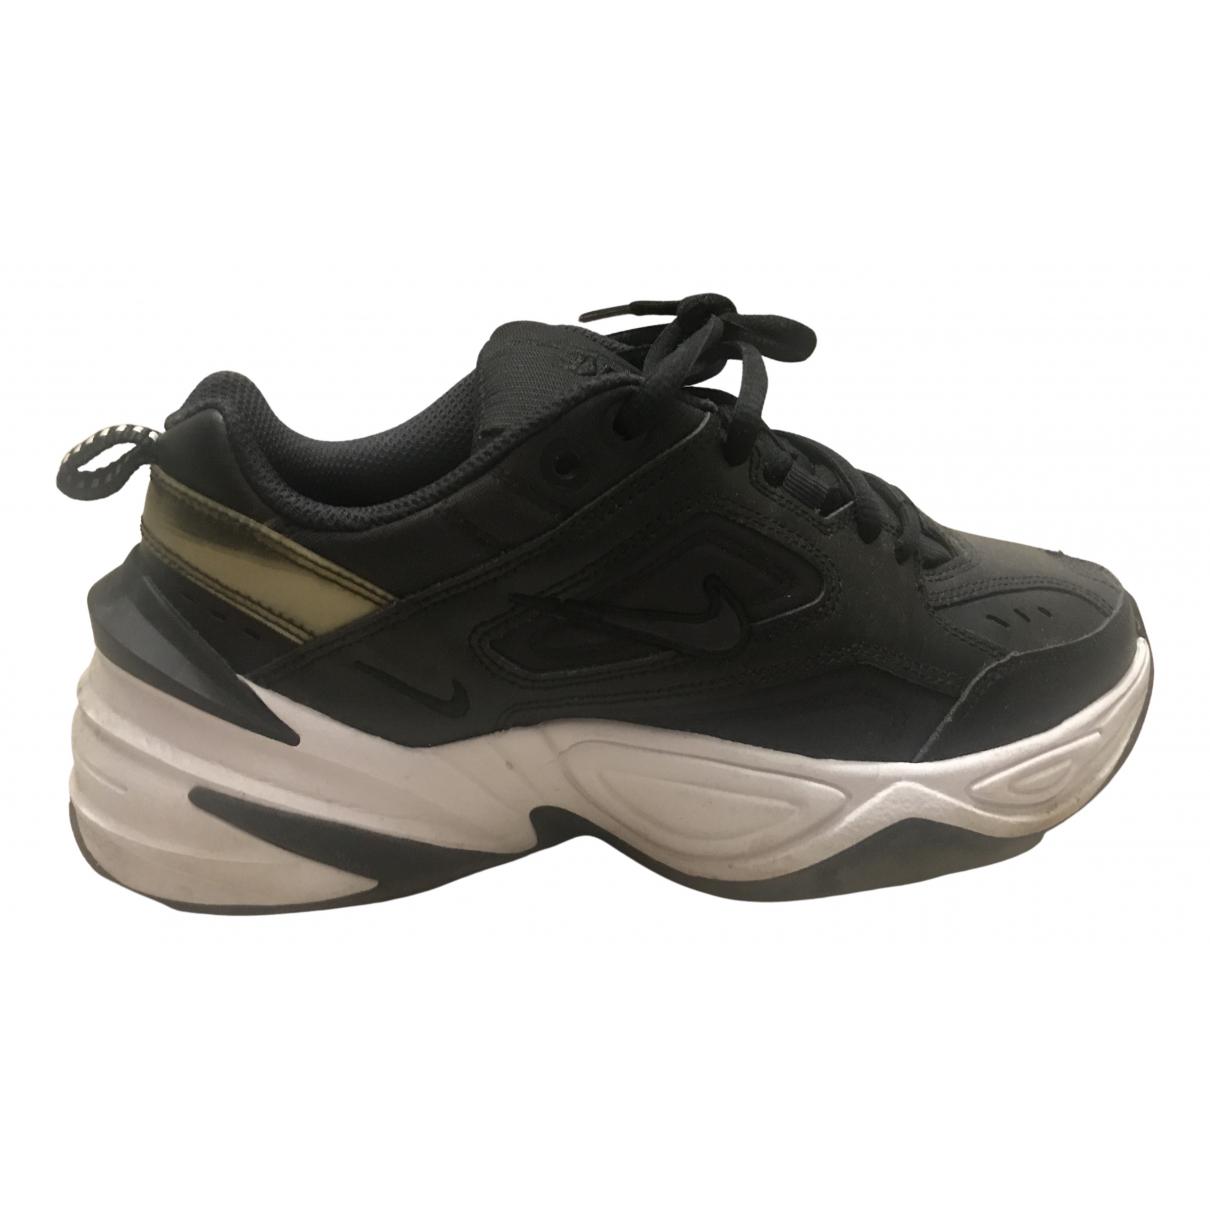 Nike M2K Tekno Black Cloth Trainers for Women 38.5 IT